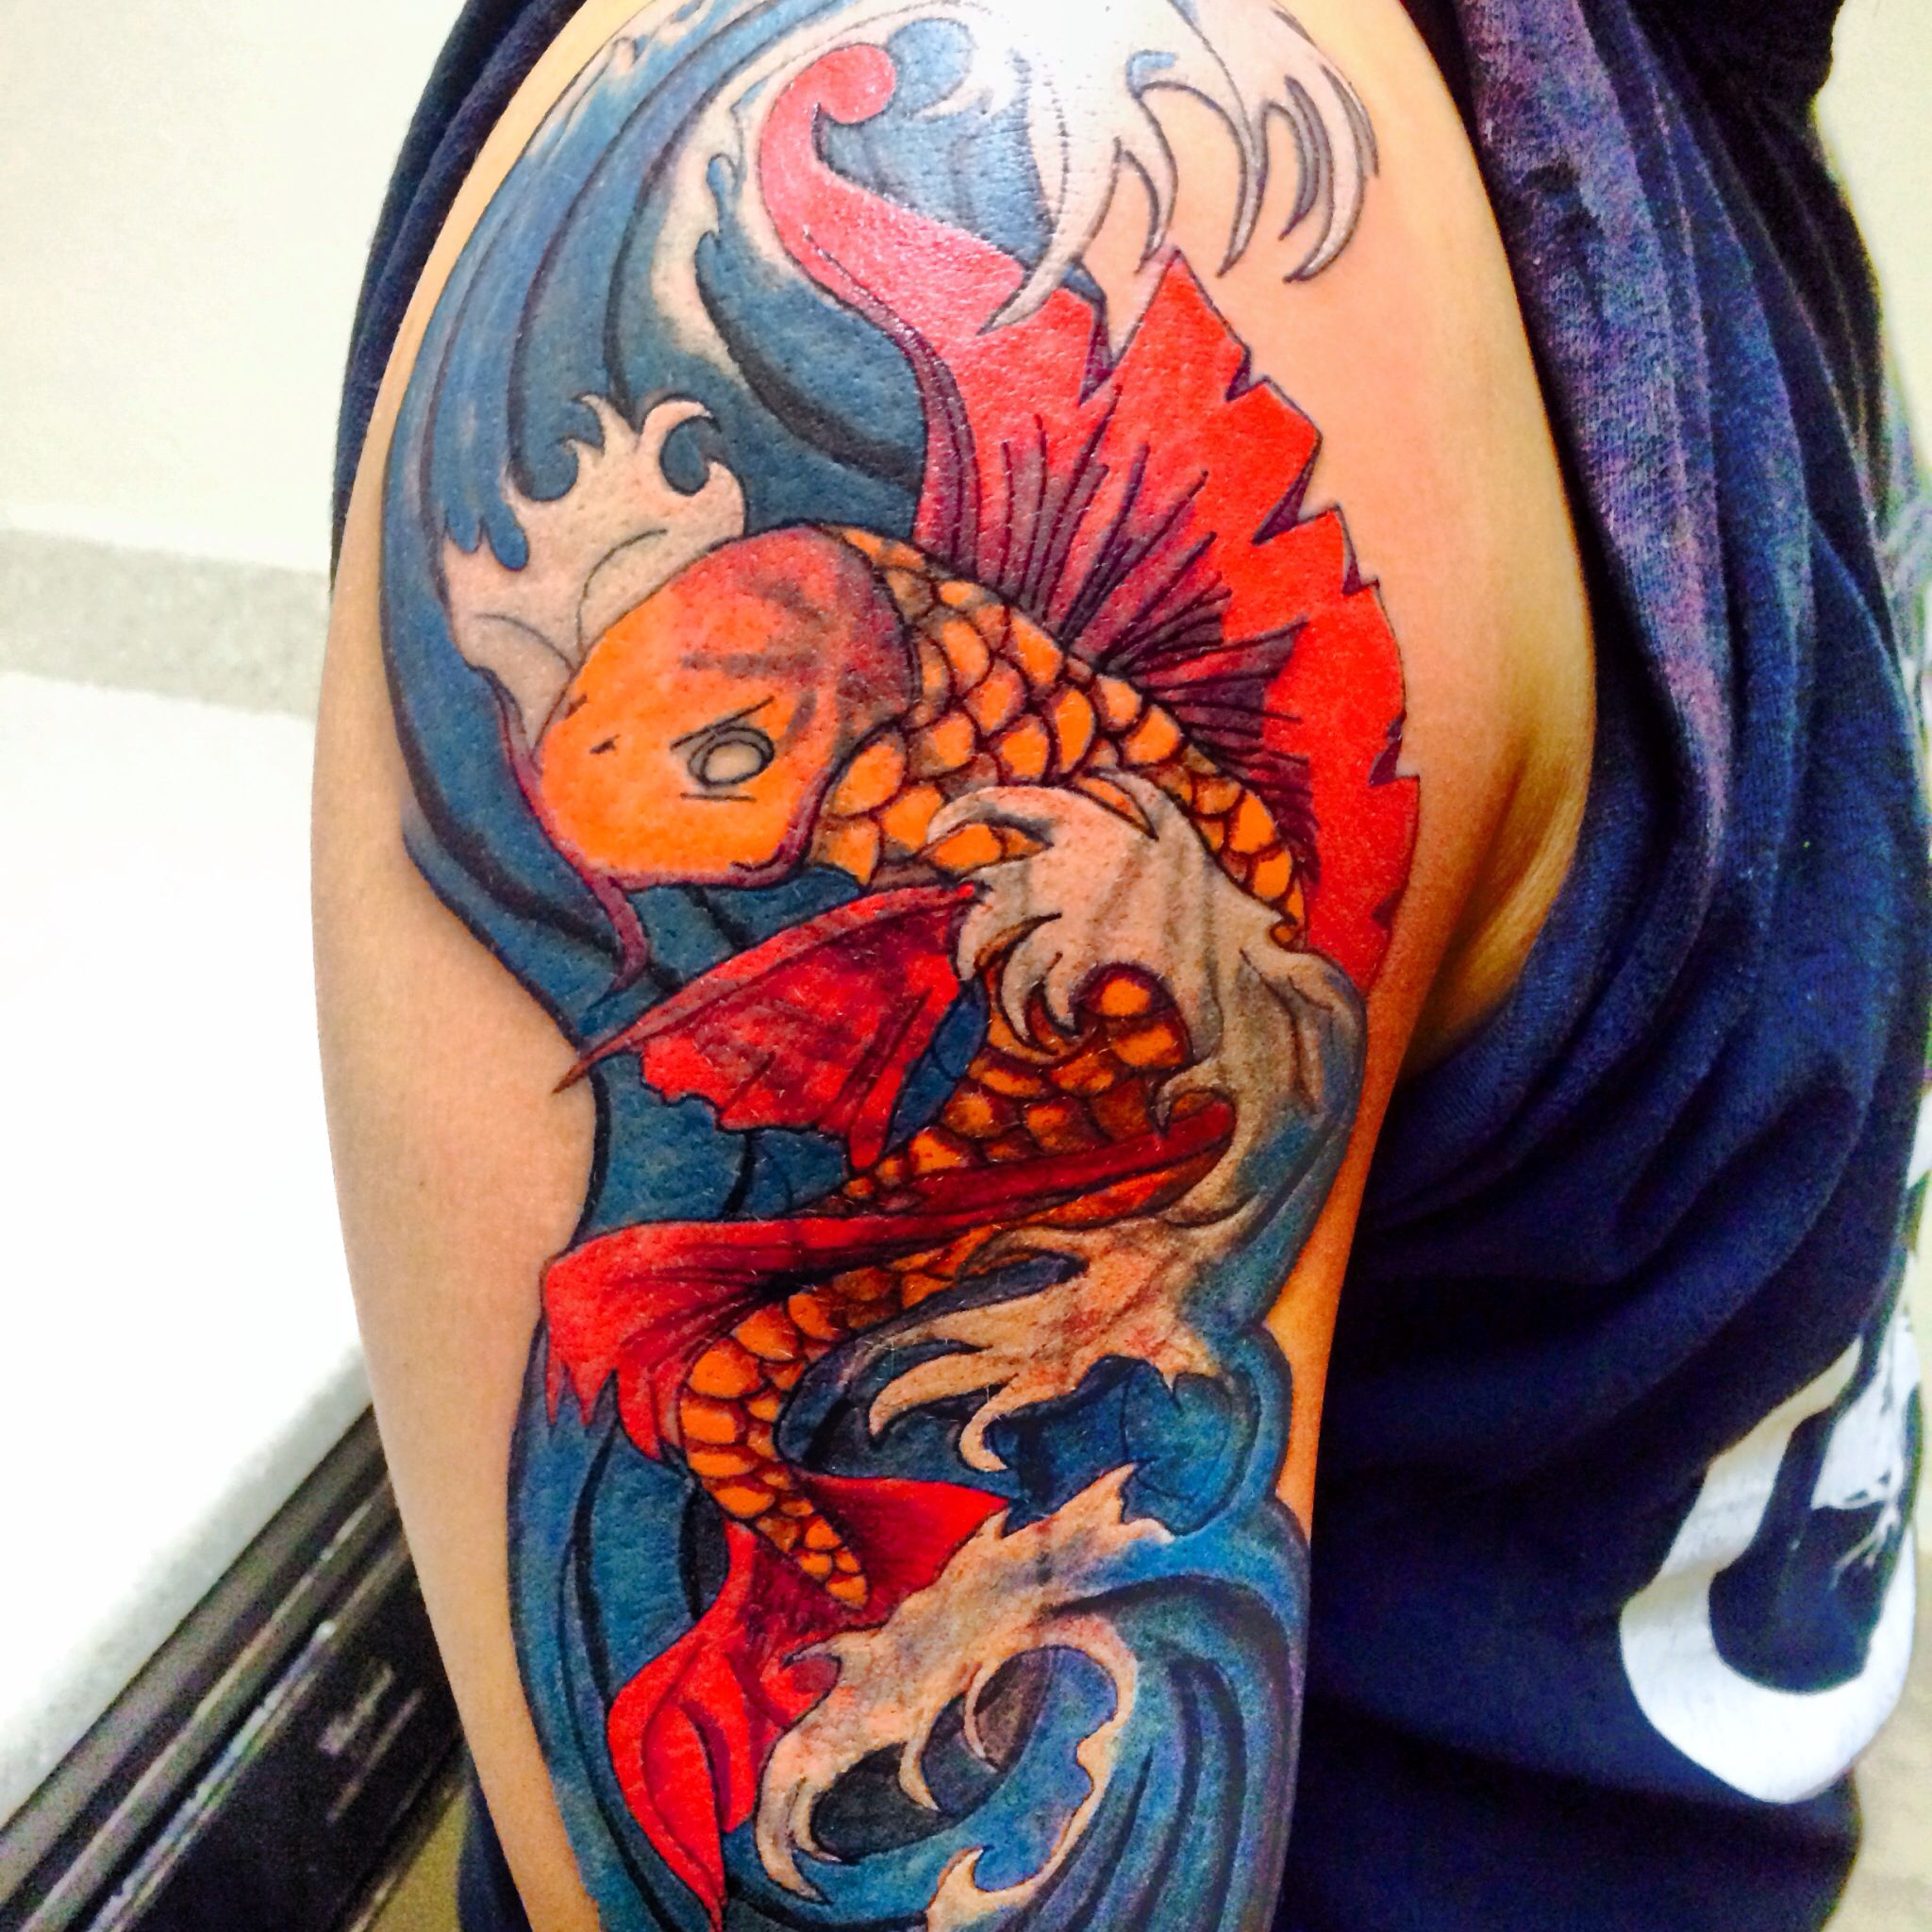 Cover up koi fish tattoo   My tatts   Pinterest   Koi fish tattoo ...